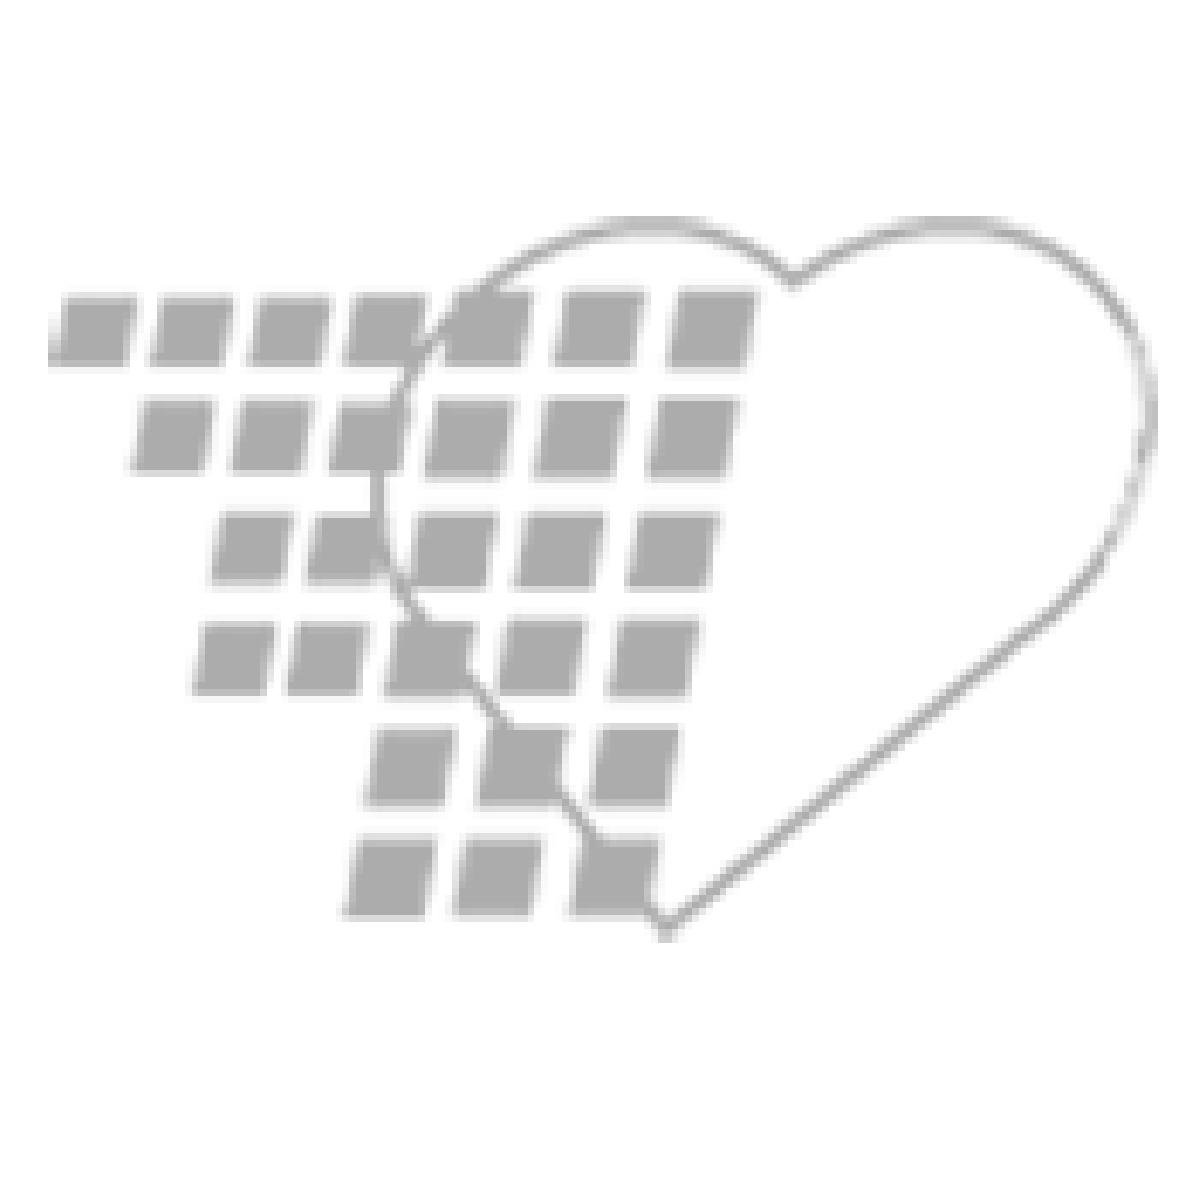 06-93-6202 - Demo Dose® Simulated Platelets B Rh Negative